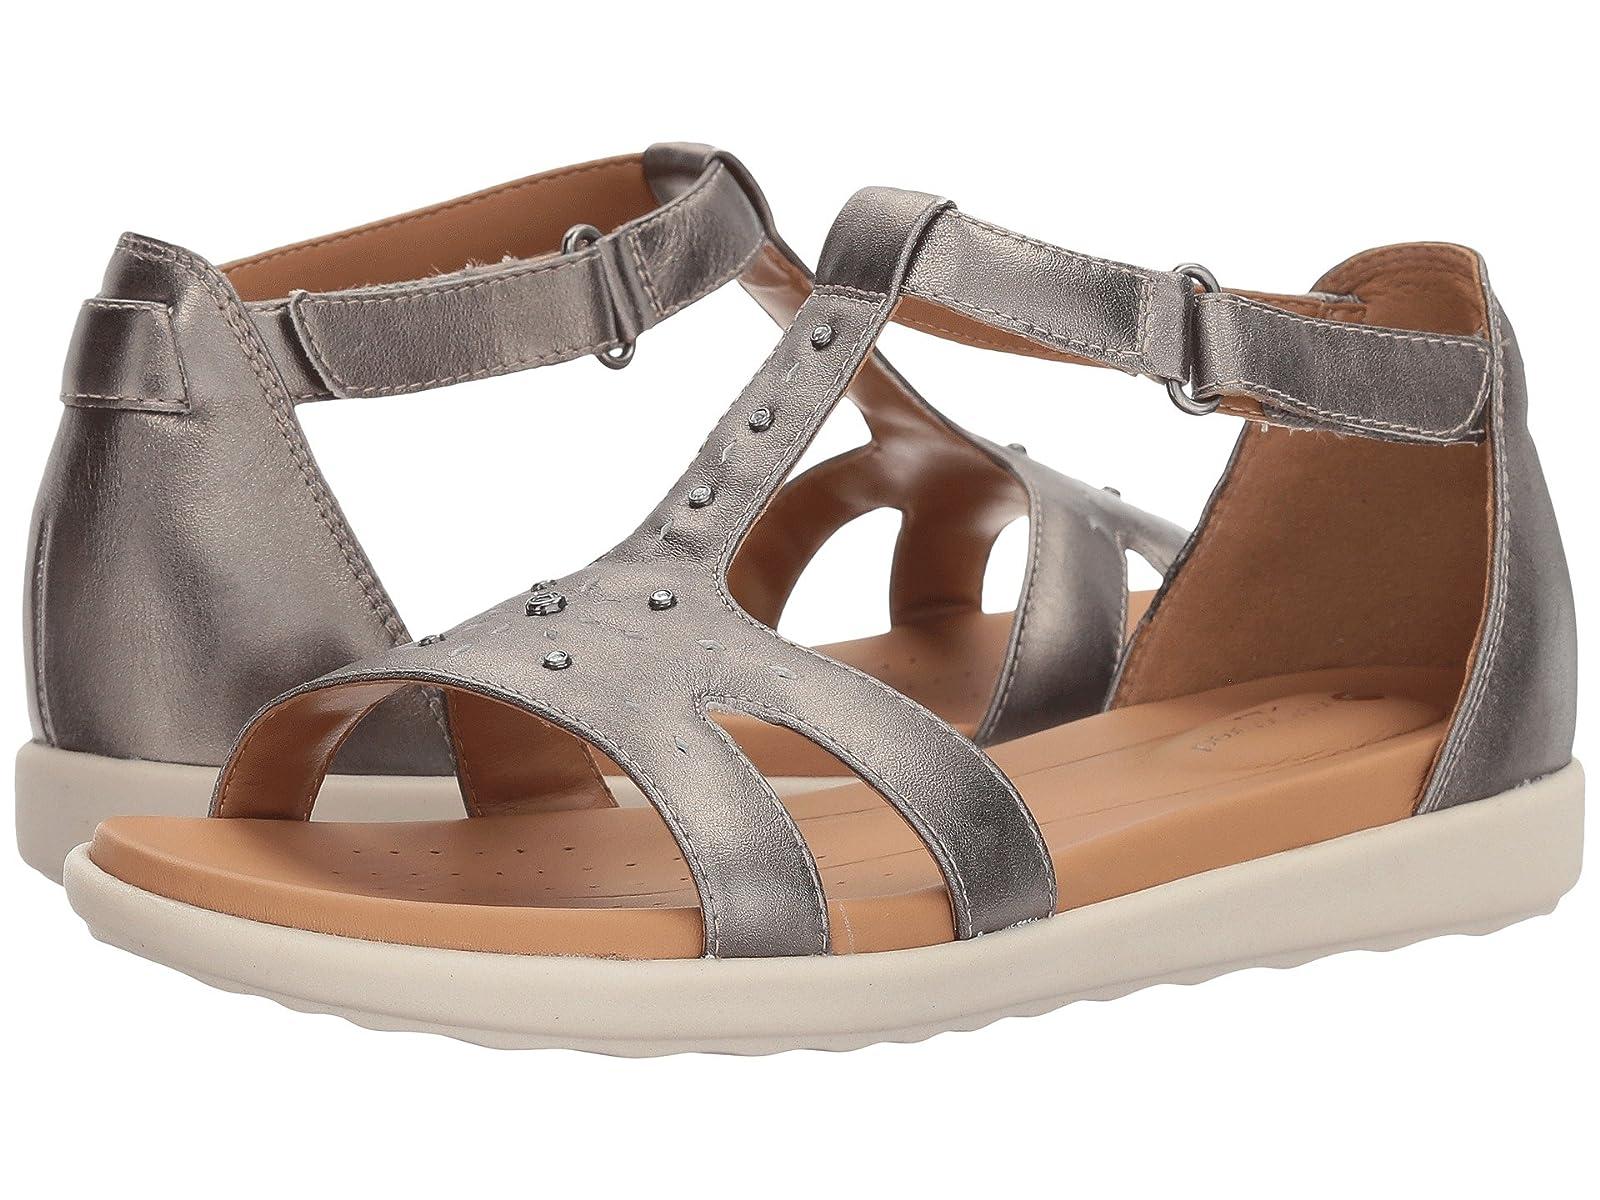 Clarks Un Reisel MaraCheap and distinctive eye-catching shoes